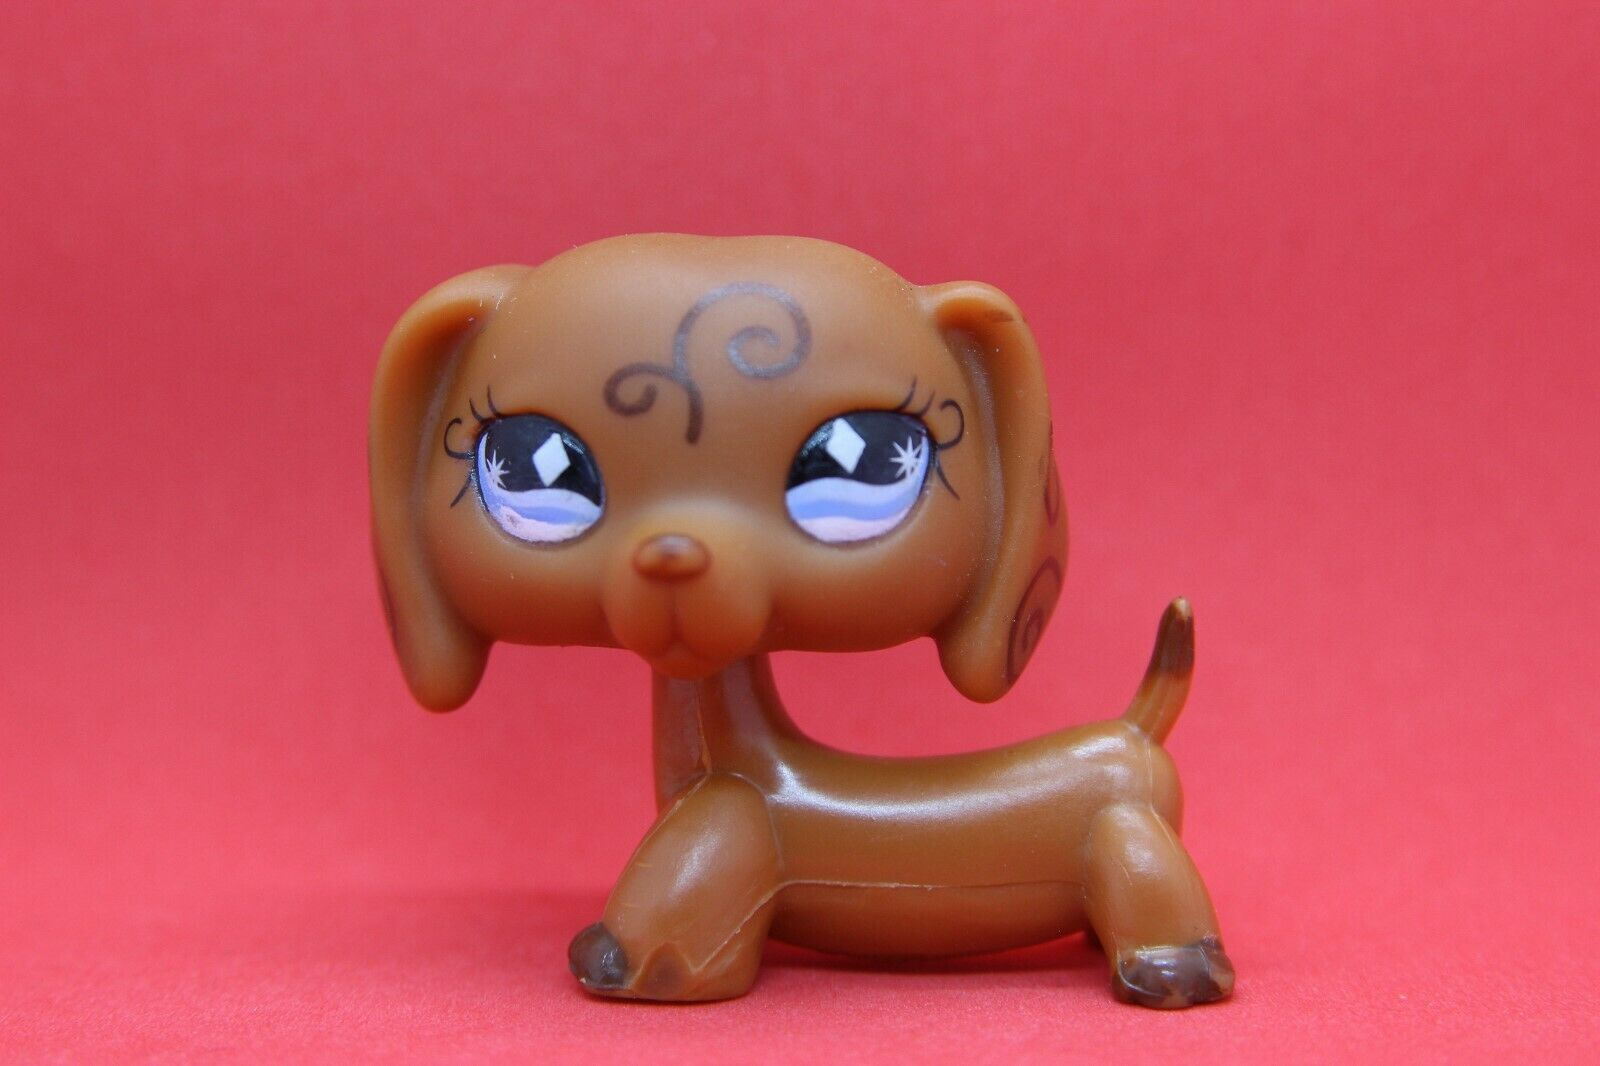 Authentic littlest petshop 640 dog dachshund / chien teckel lps pet shop